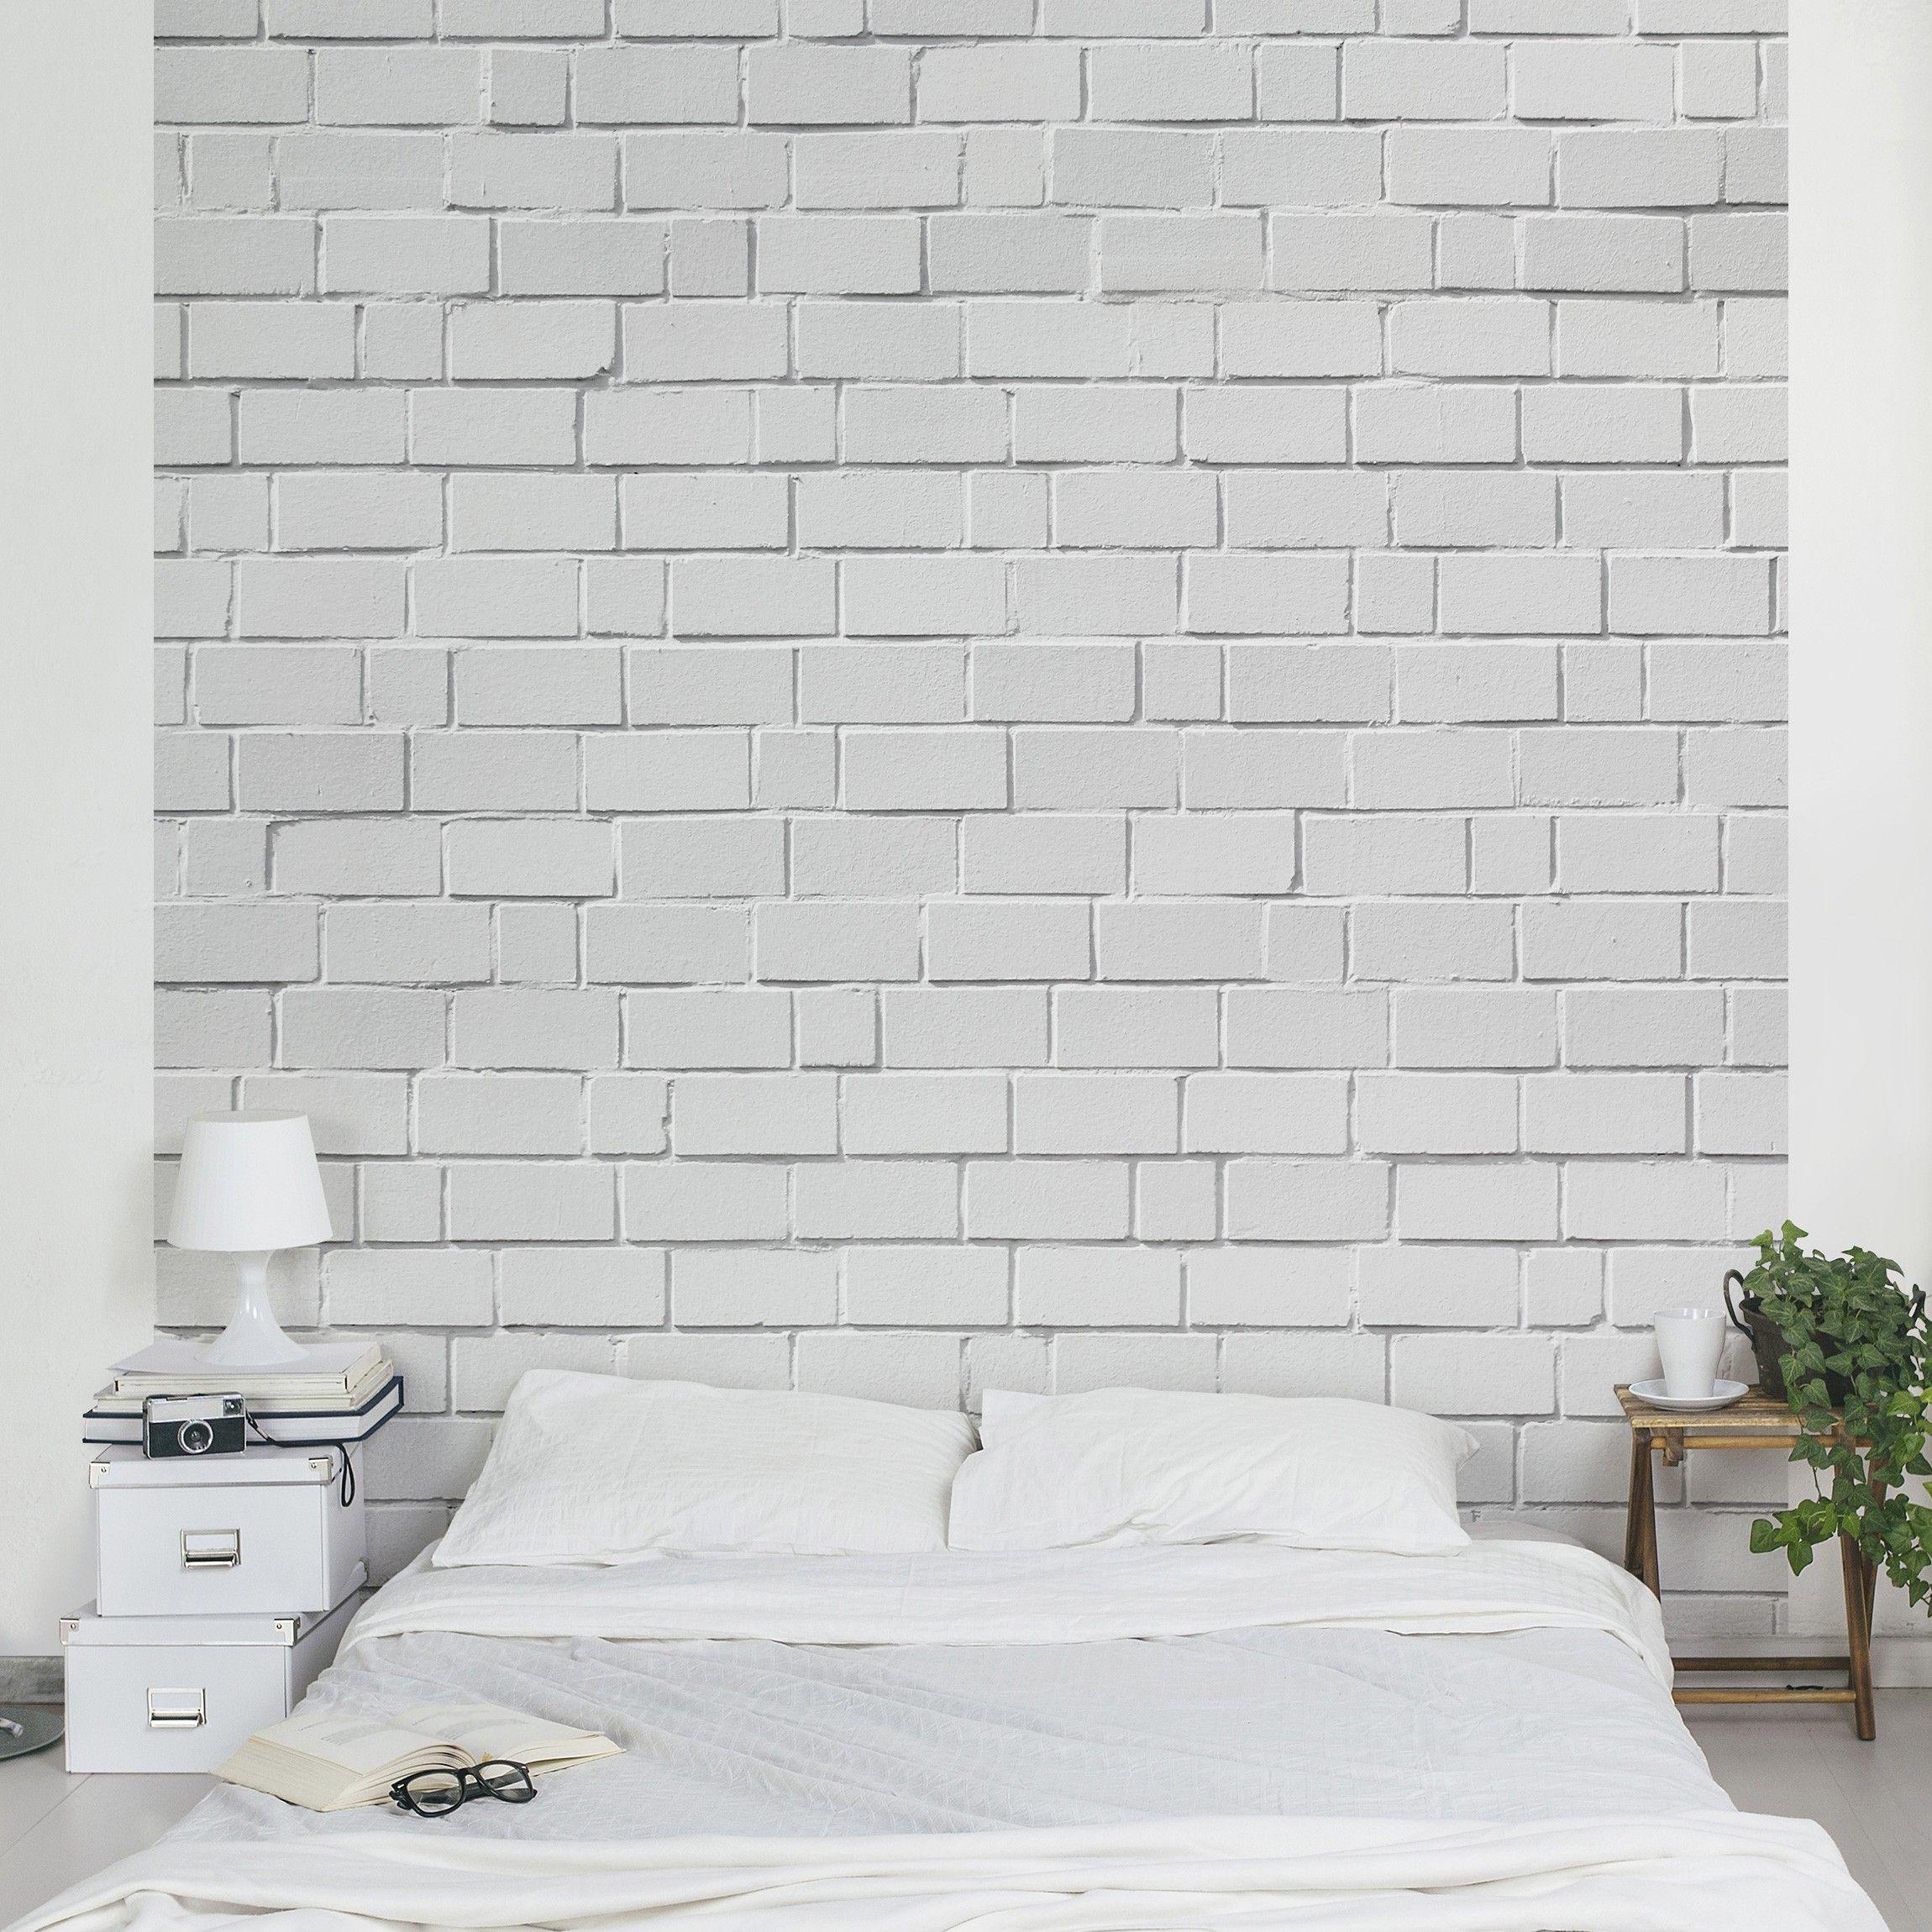 backstein tapete wei white stonewall vlies fototapete quadrat. Black Bedroom Furniture Sets. Home Design Ideas